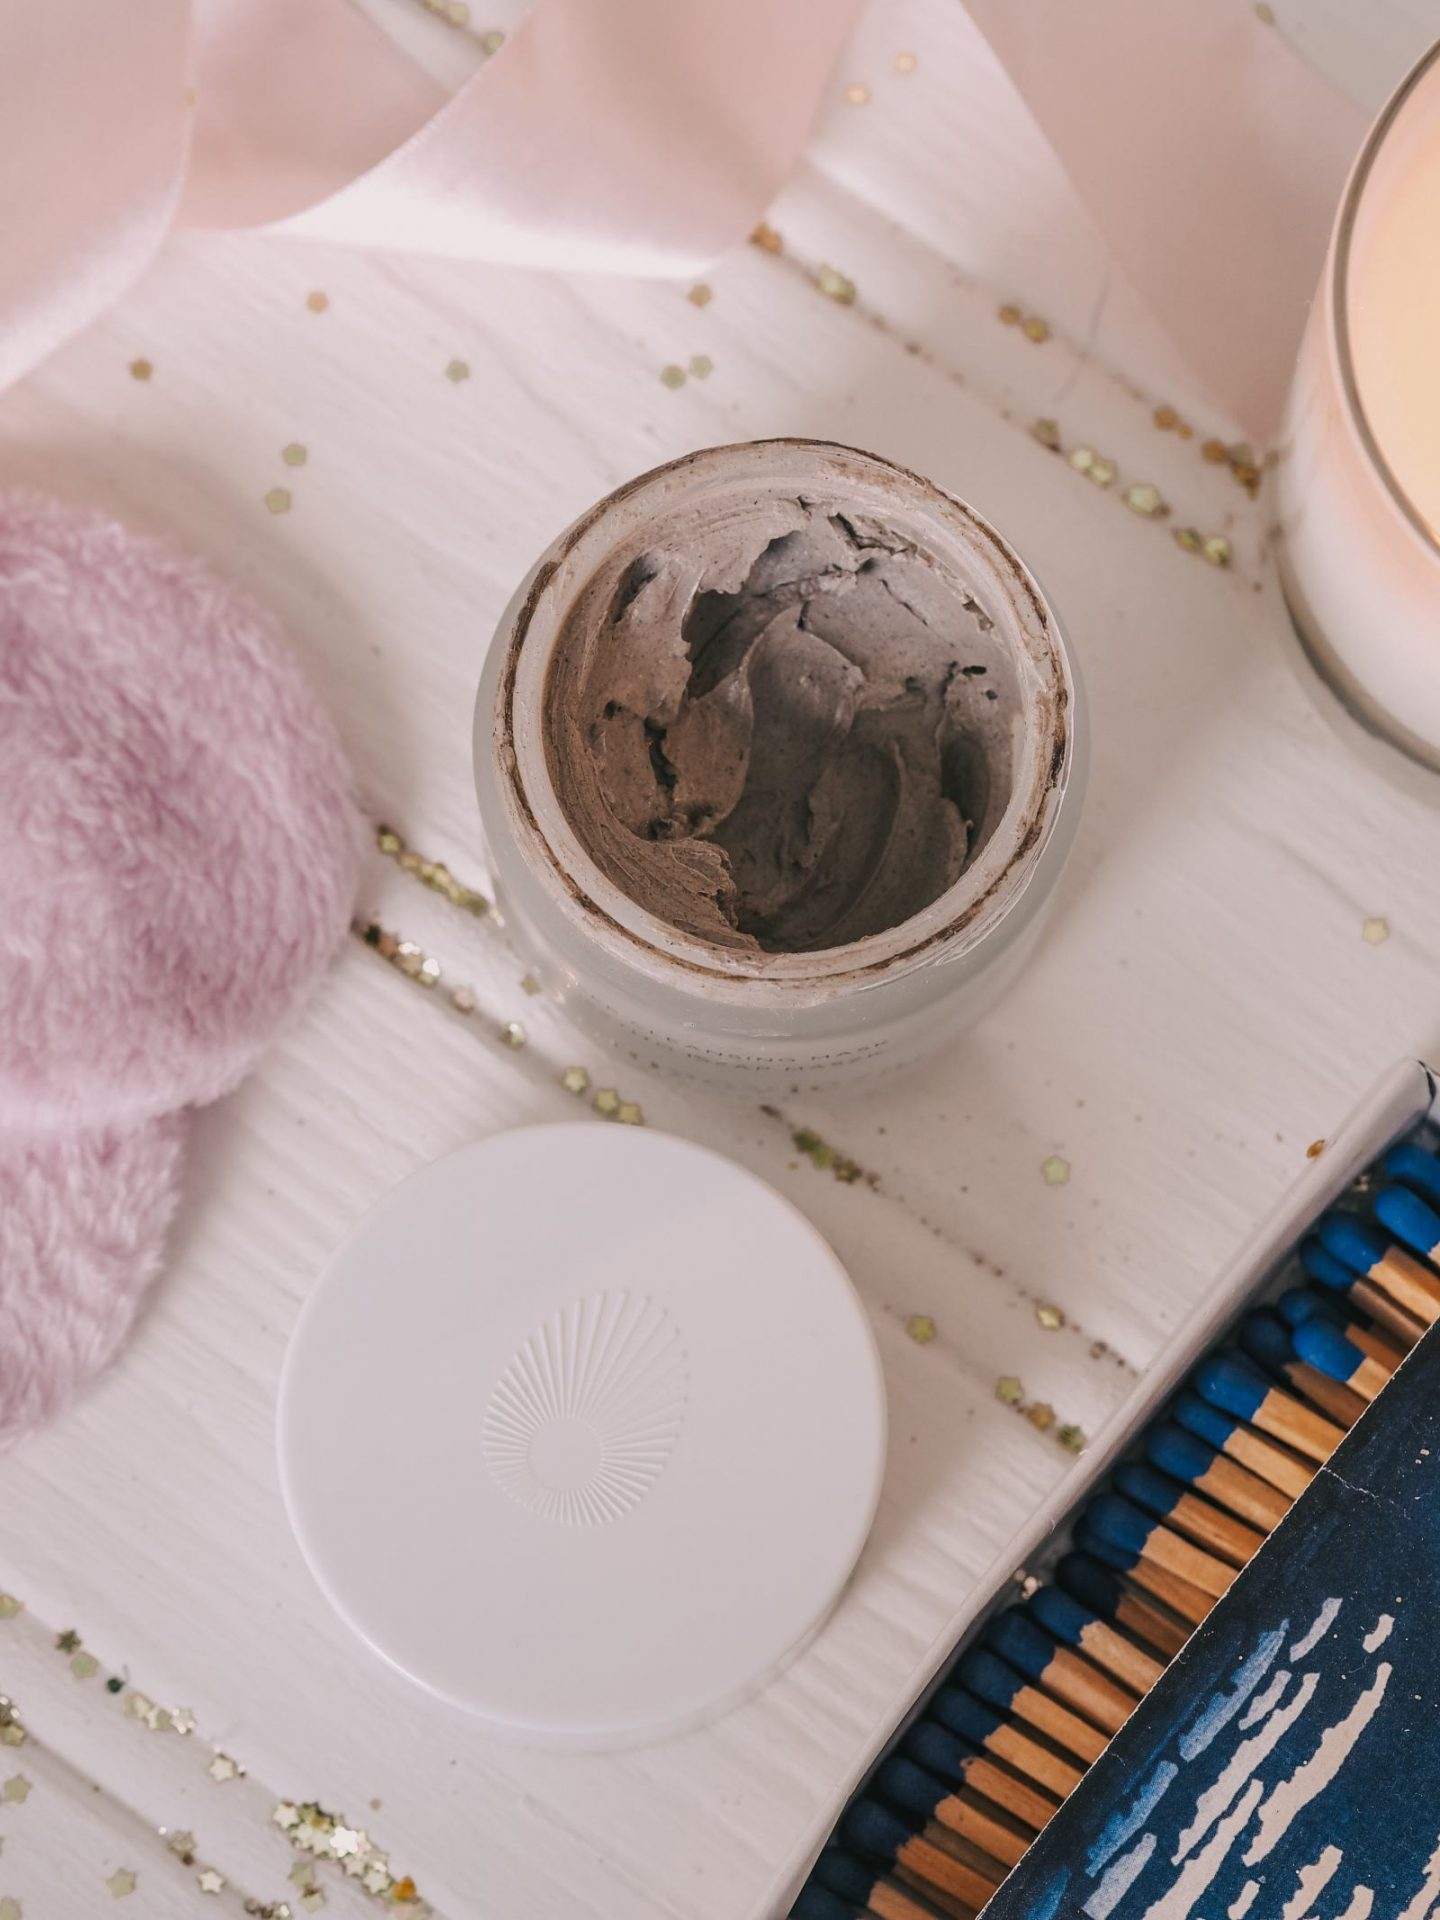 Omorovicza Deep Cleansing Mud Mask review